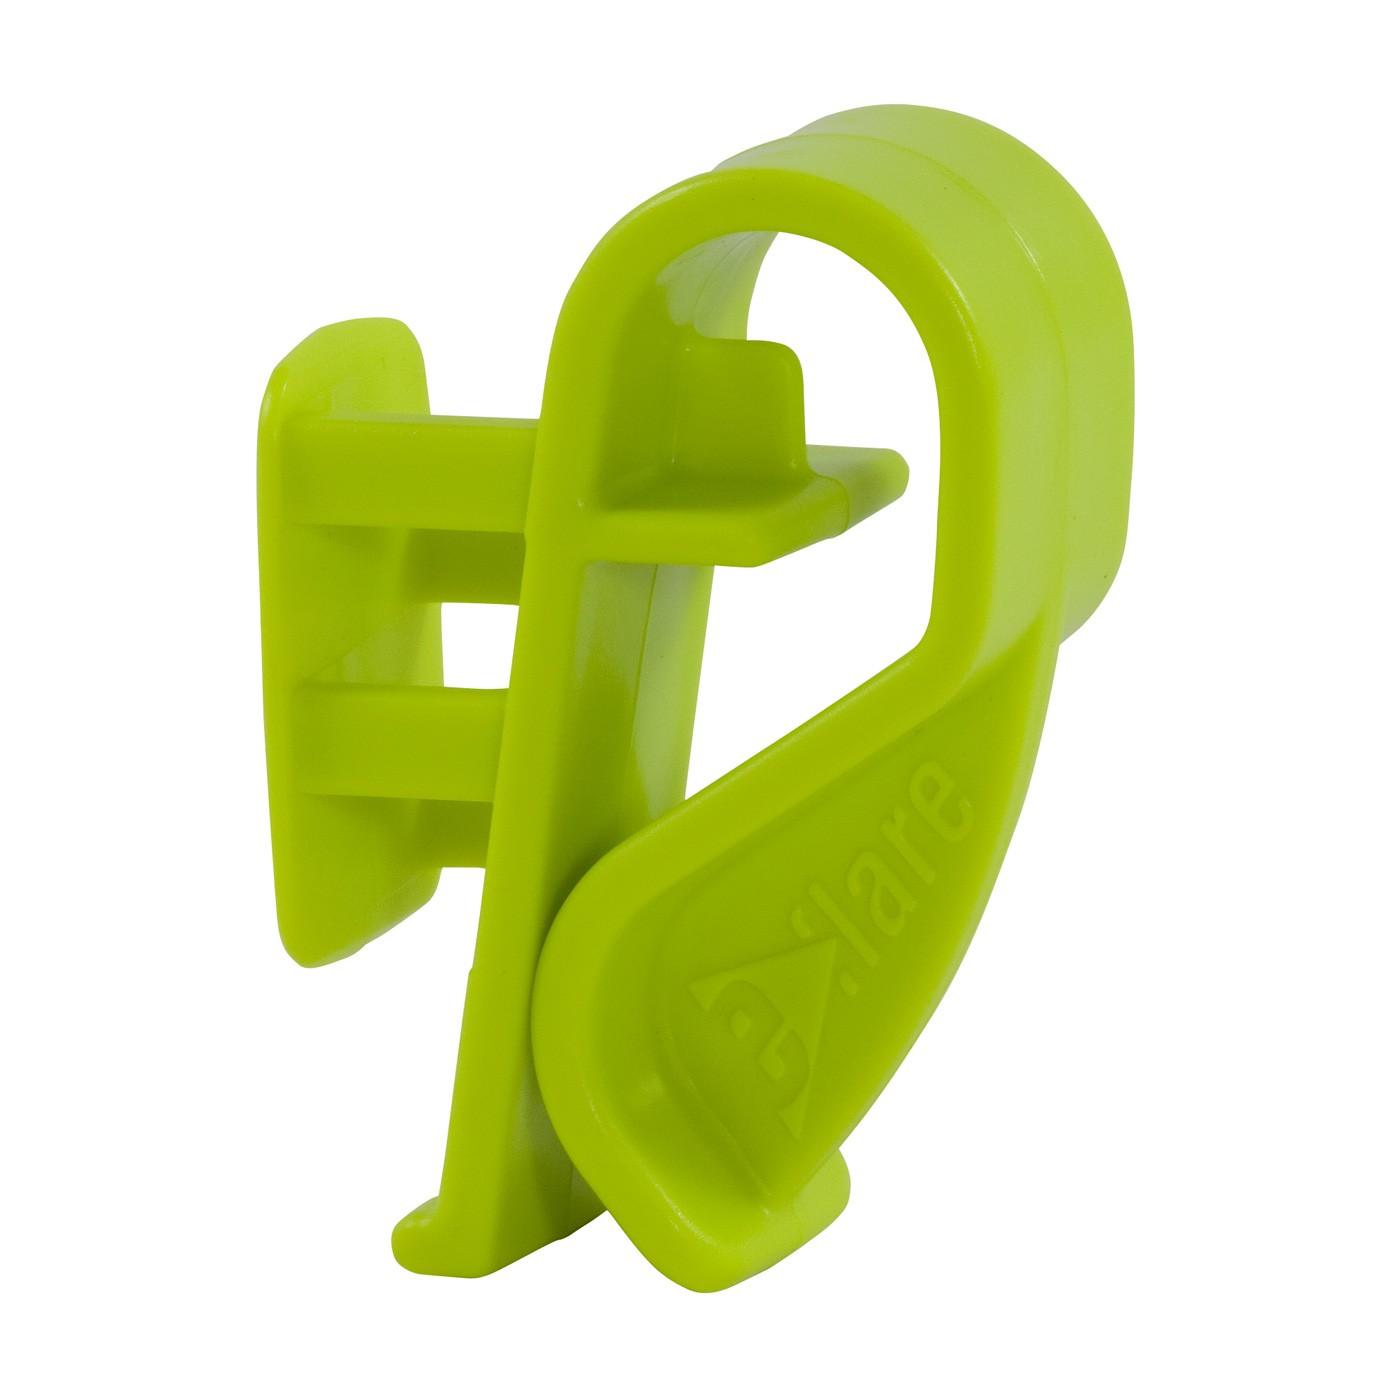 Eflare™ Cone Mounting Clip  (#939-EFCLIP)